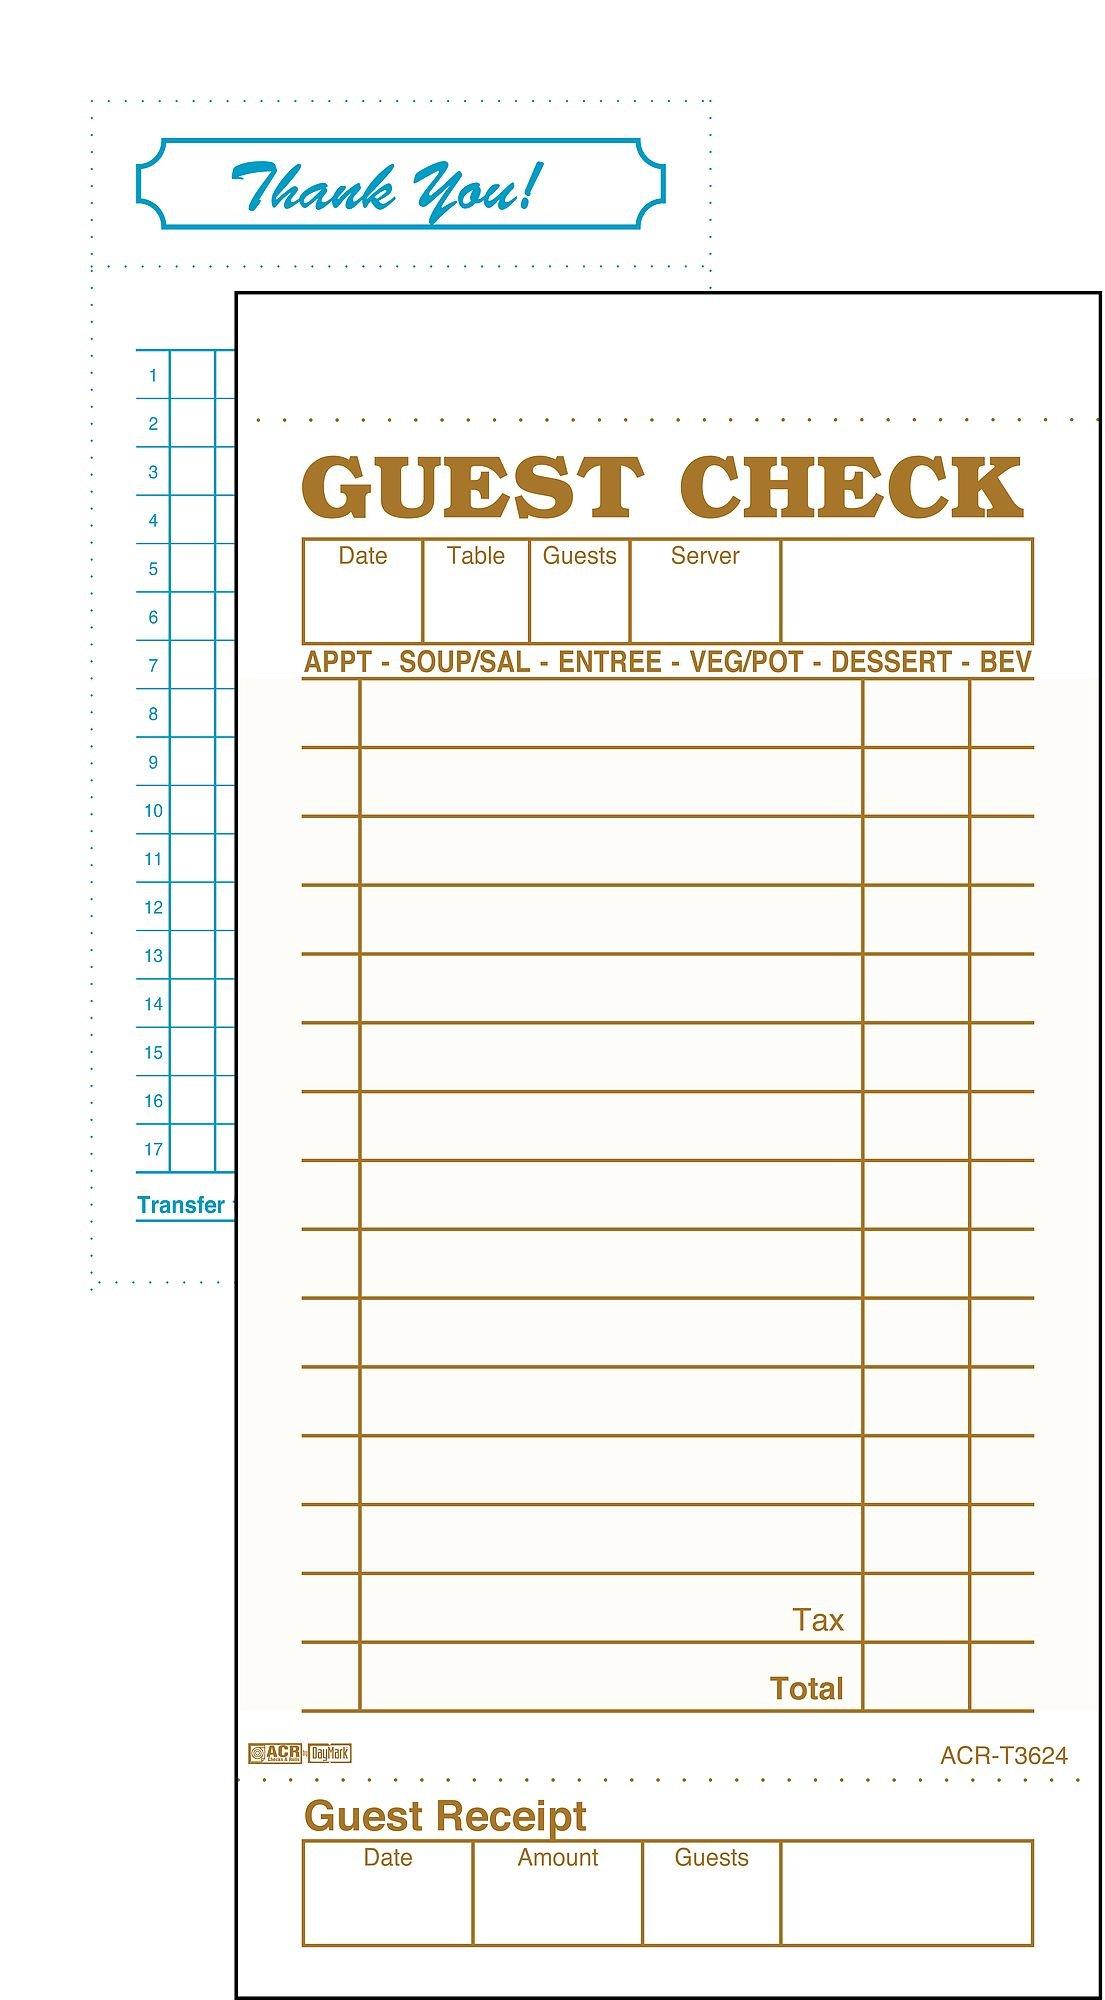 DayMark ACR-T3624 Guest Check Bond, 1 Part, Tan, 6-3/4'' Length x 3-13/32'' Width (Case of 50 Packs, 100 Sheets per Pad)